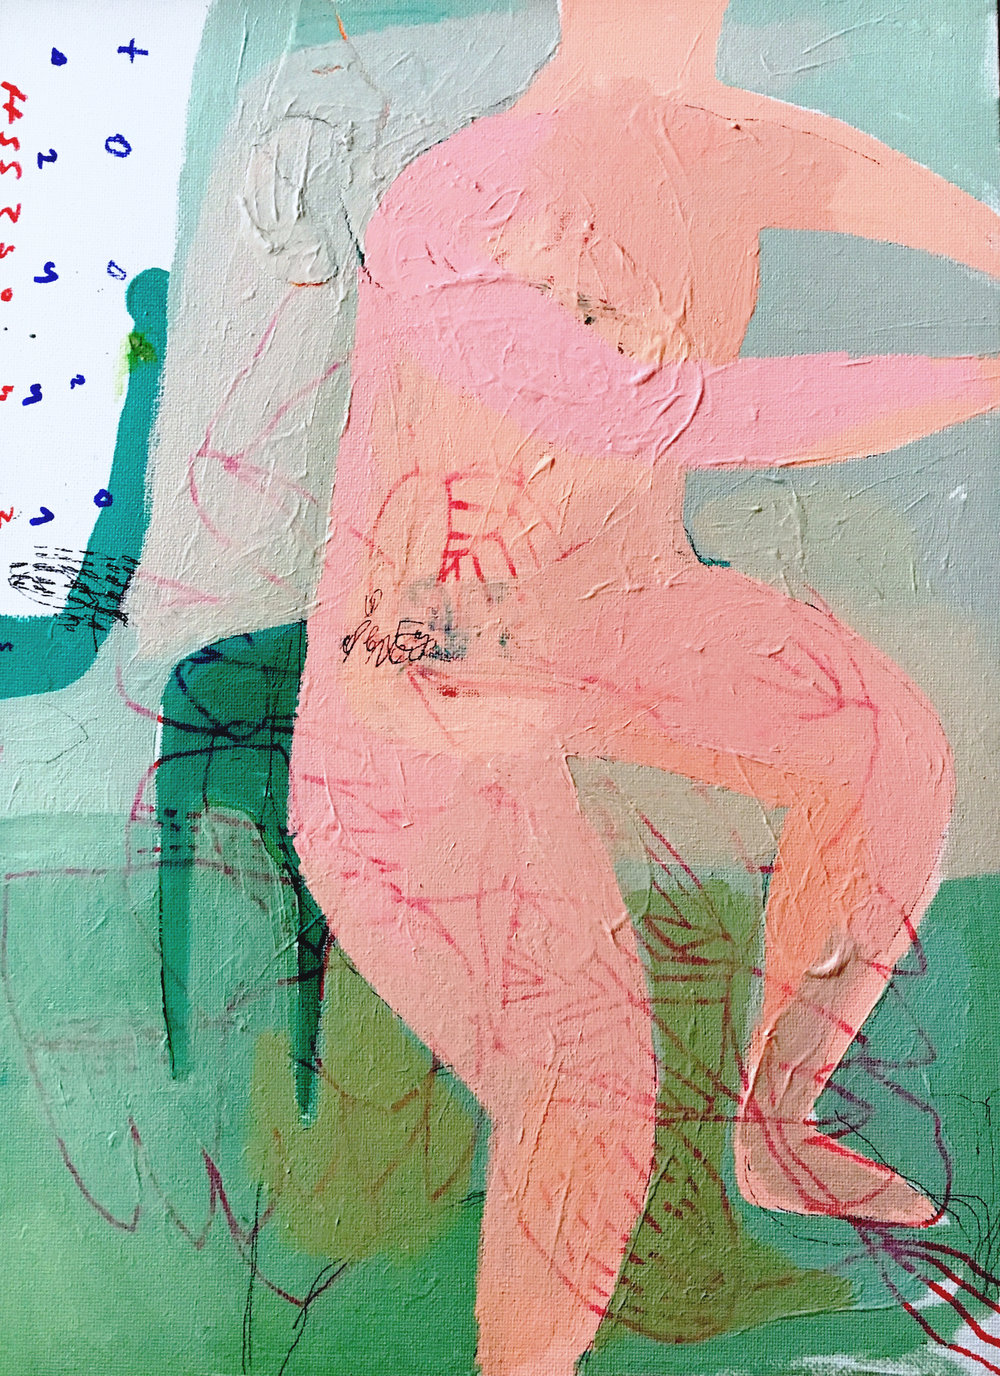 Sable Noir 2, Acrylic on Canvas, 40 x 30 cm, £880  Enquires:  olia@luminairearts.co.uk